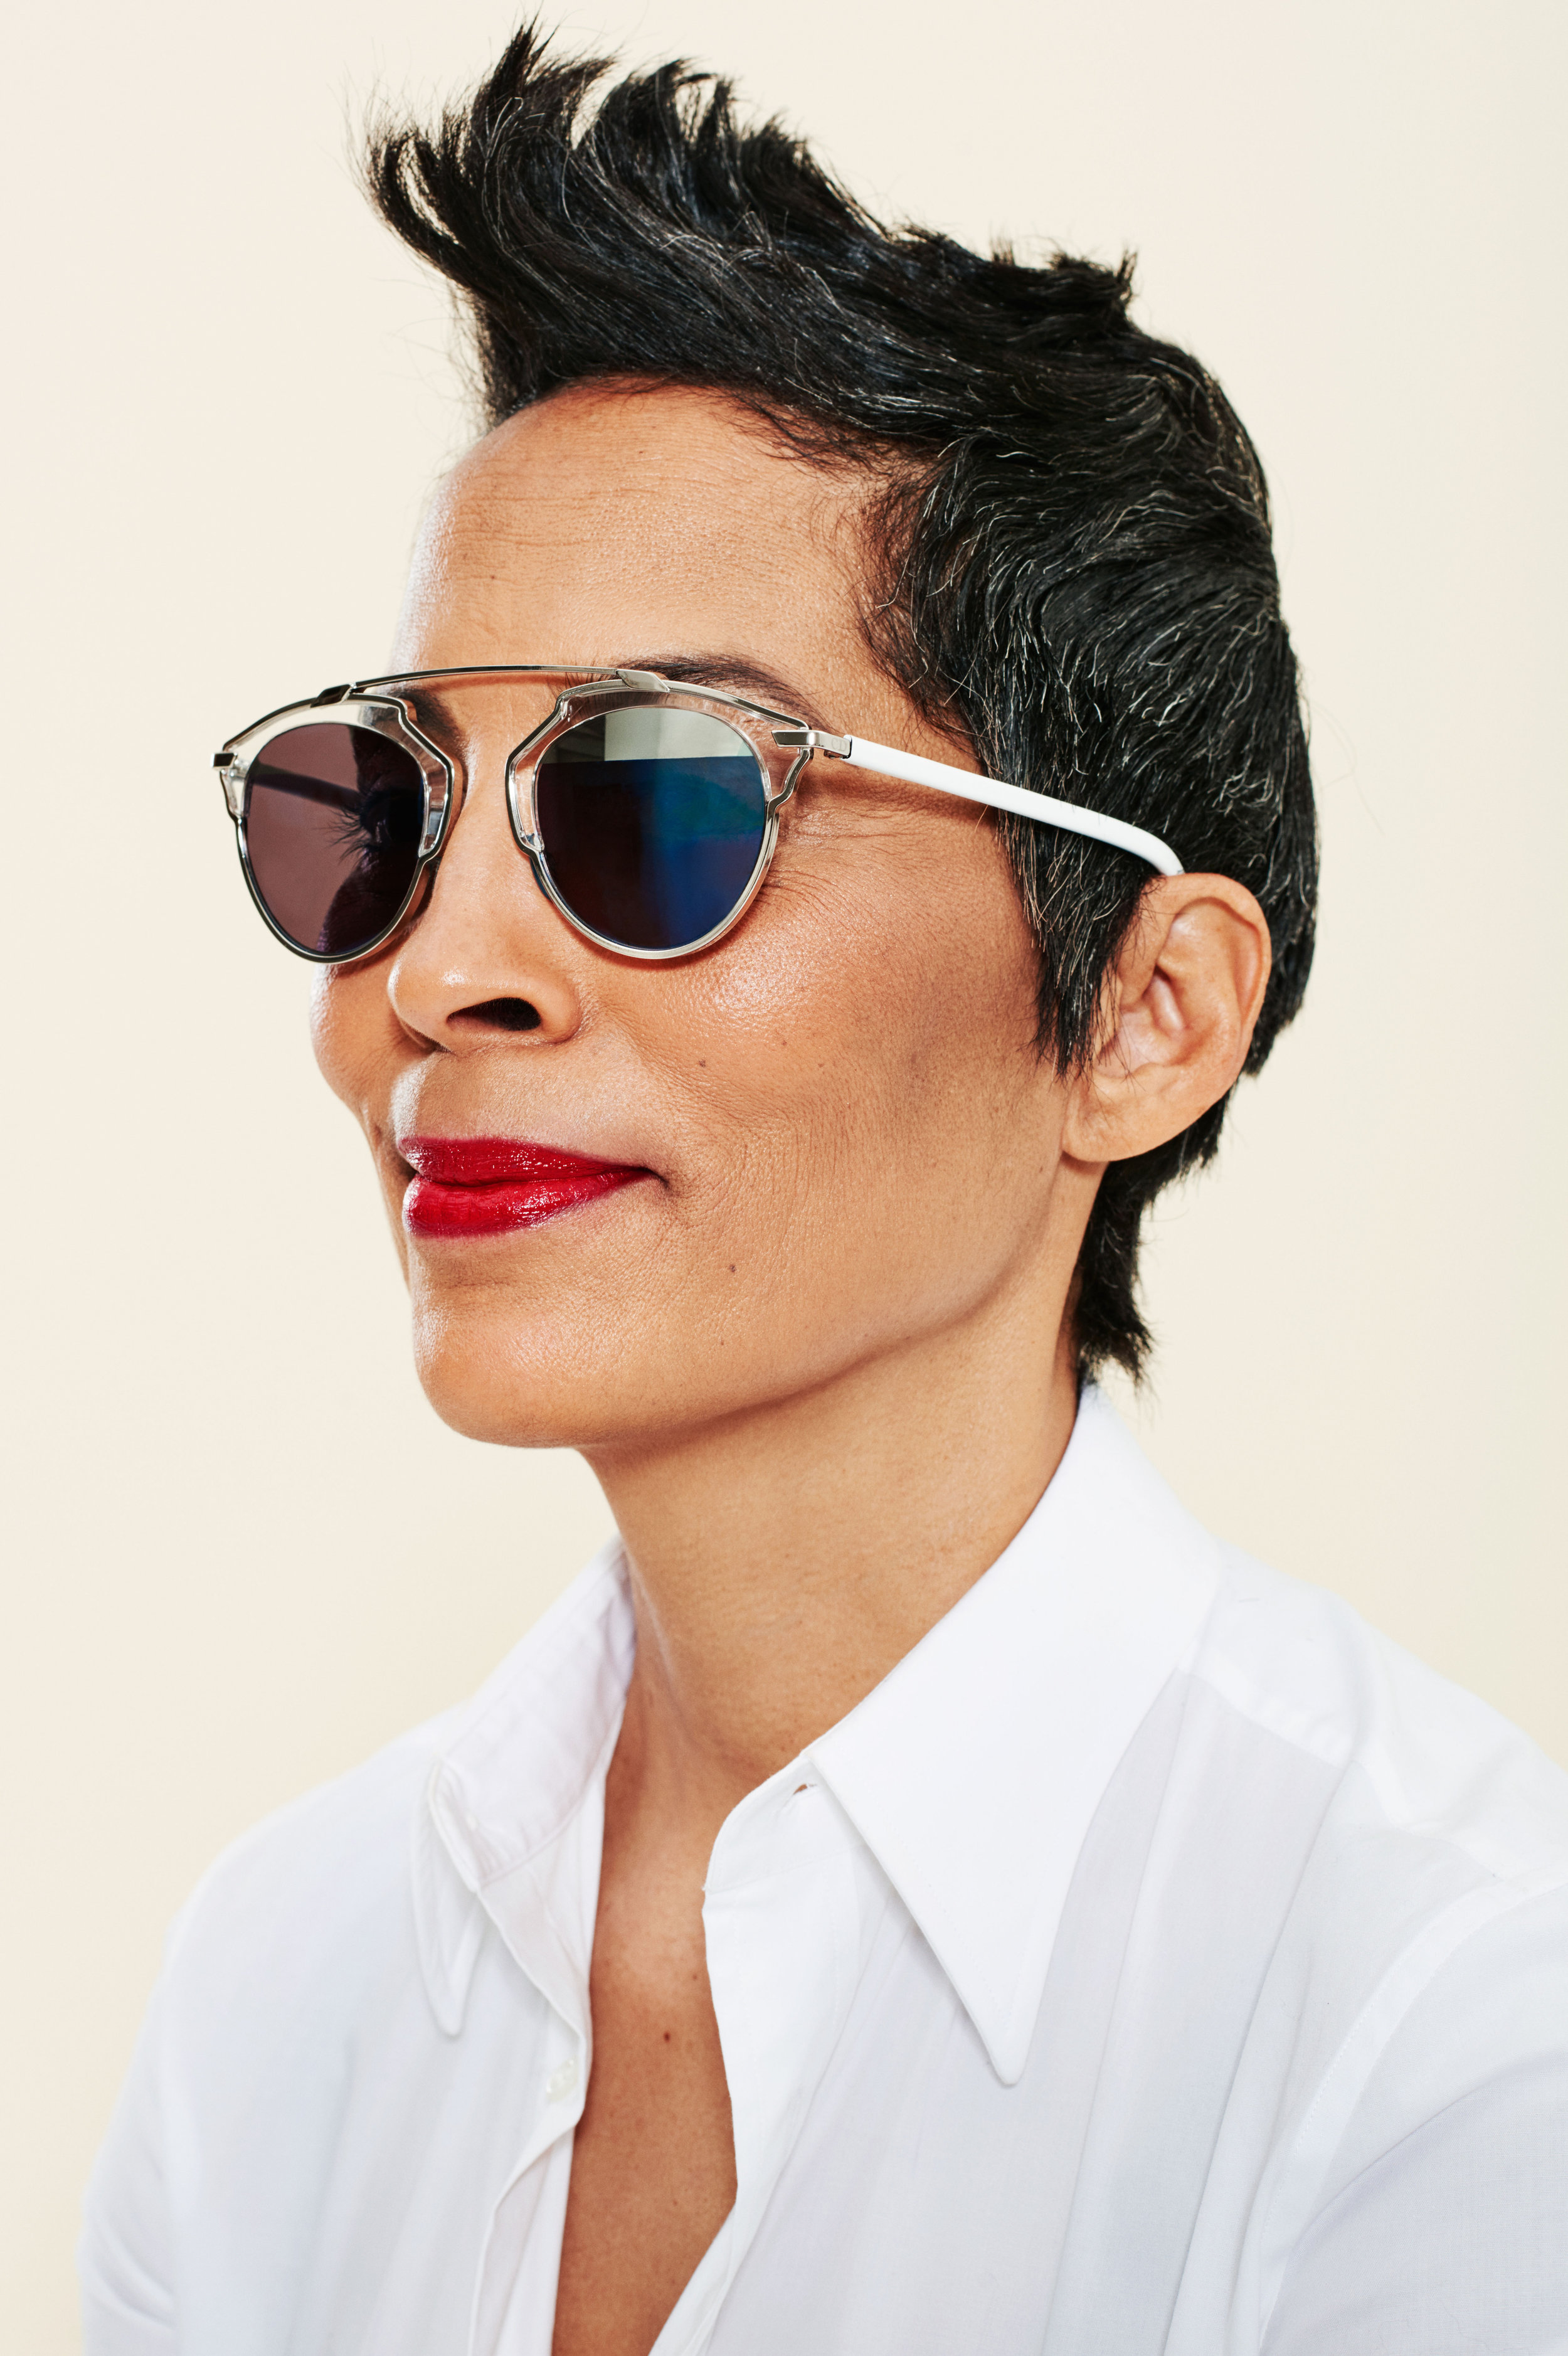 sunglasses-lipsticks-06.w4500.h6760.jpg